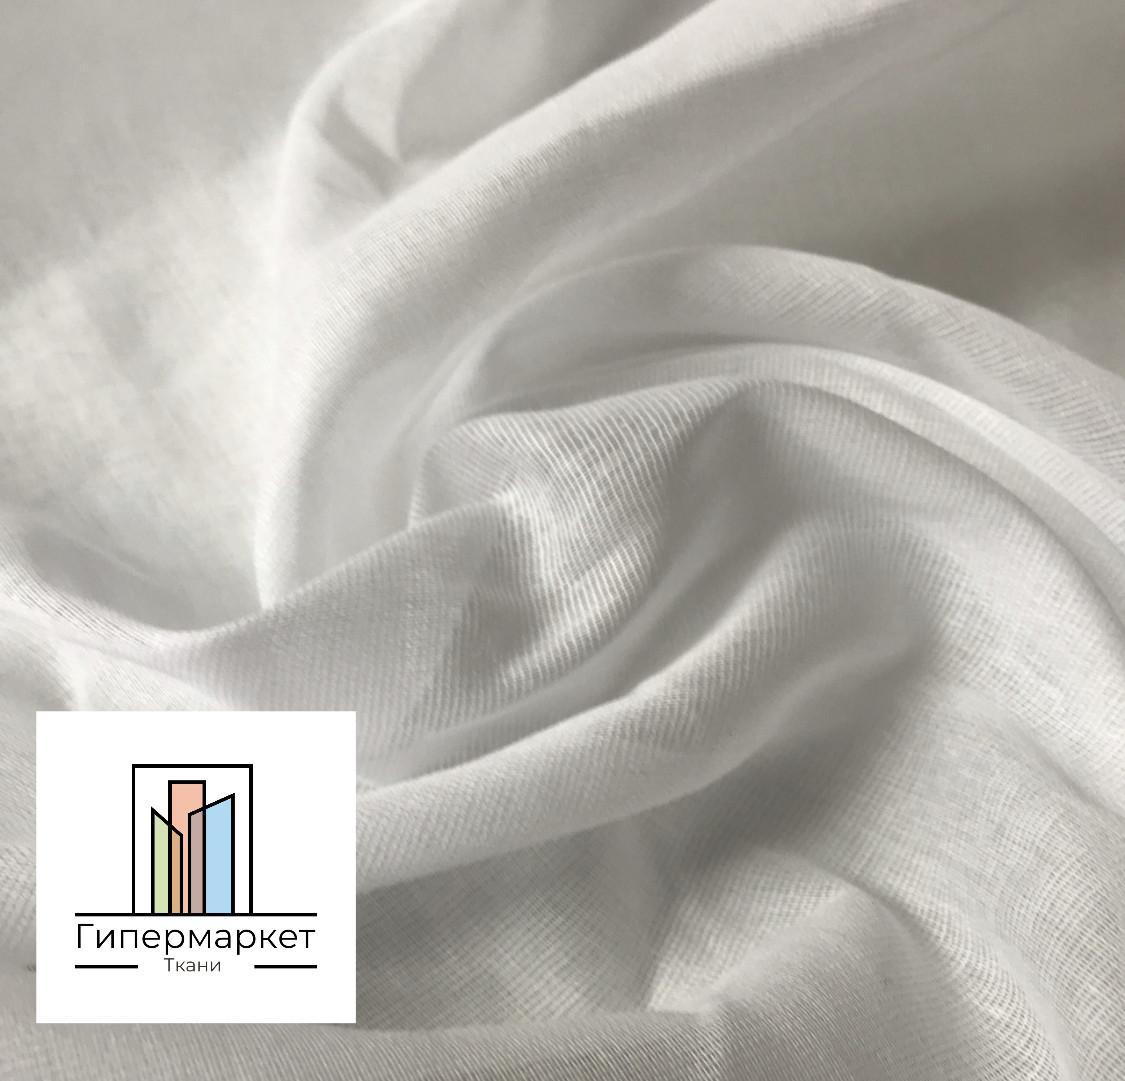 Ткань Белый Ситец 80см ширина 100% хлопок